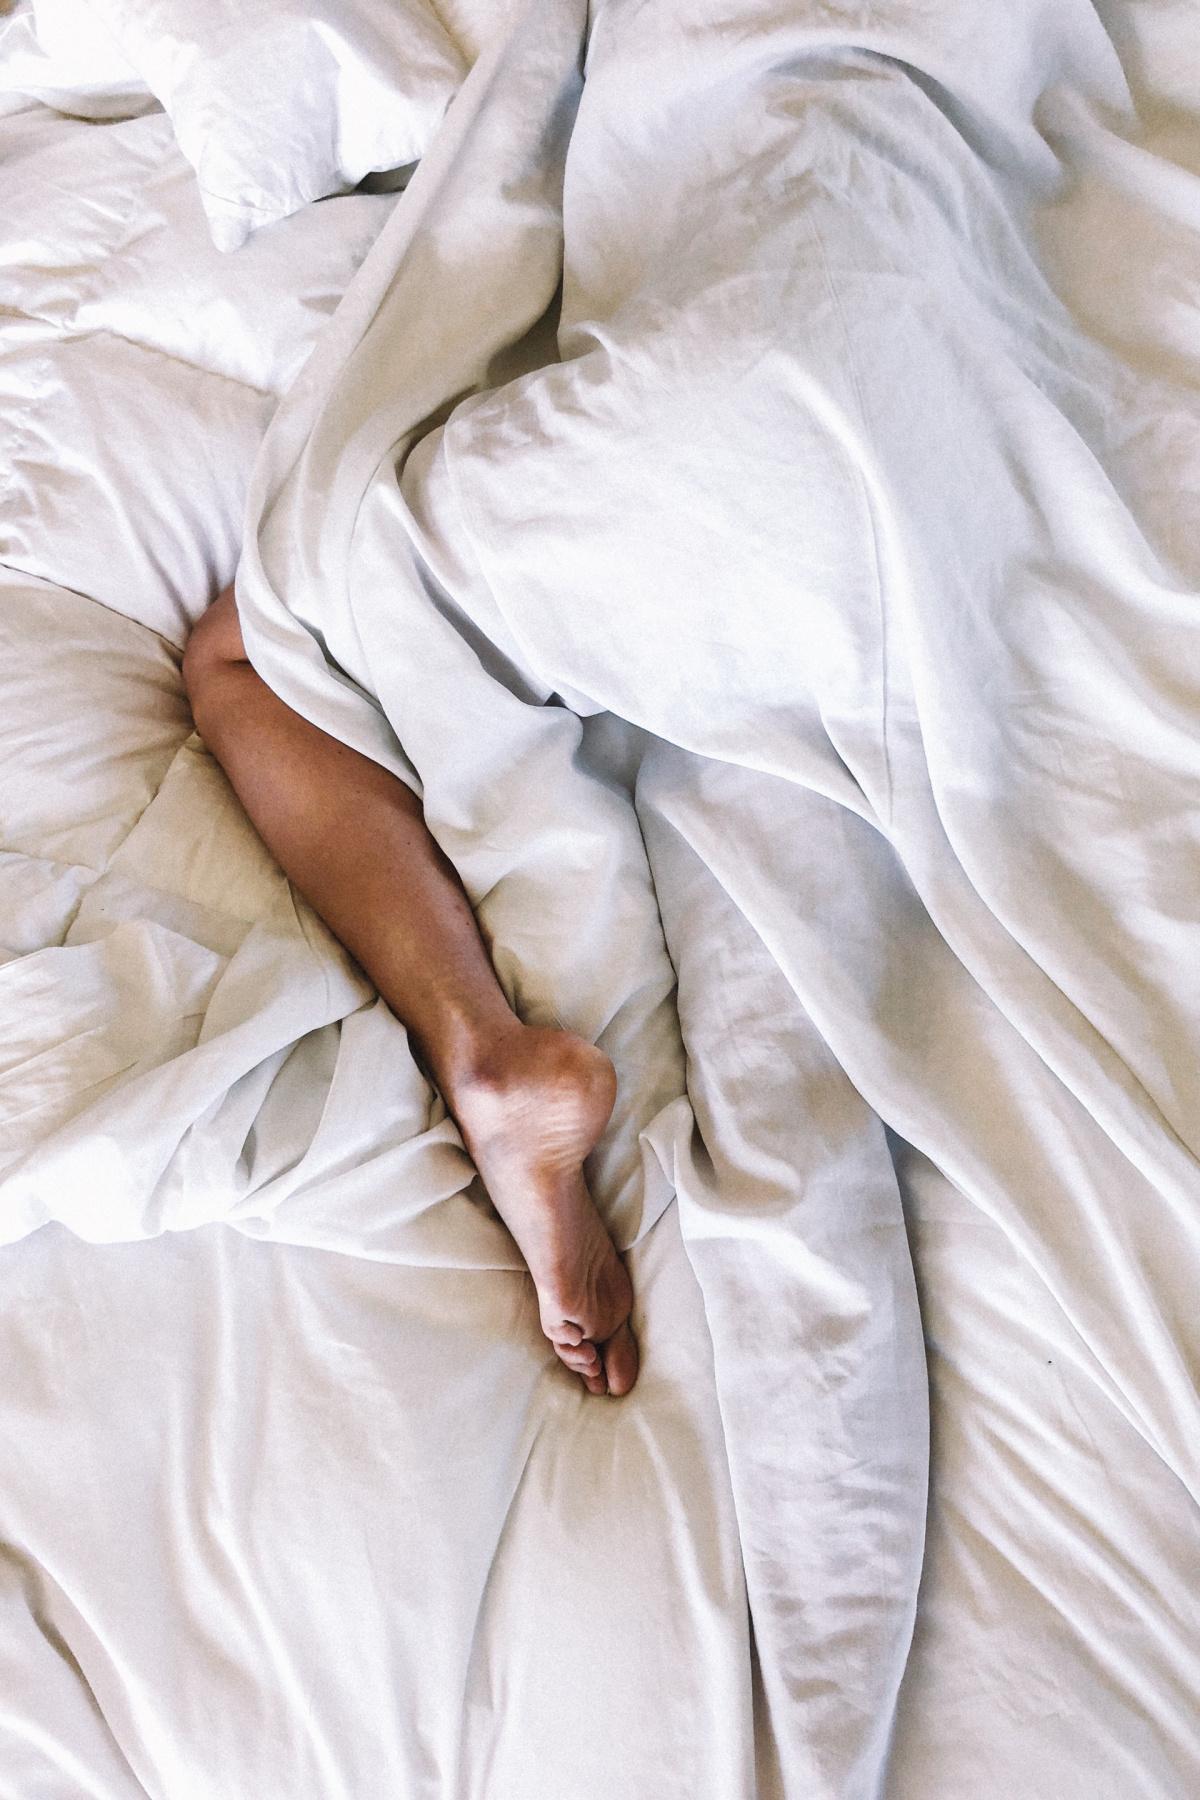 woman sleeping under covers